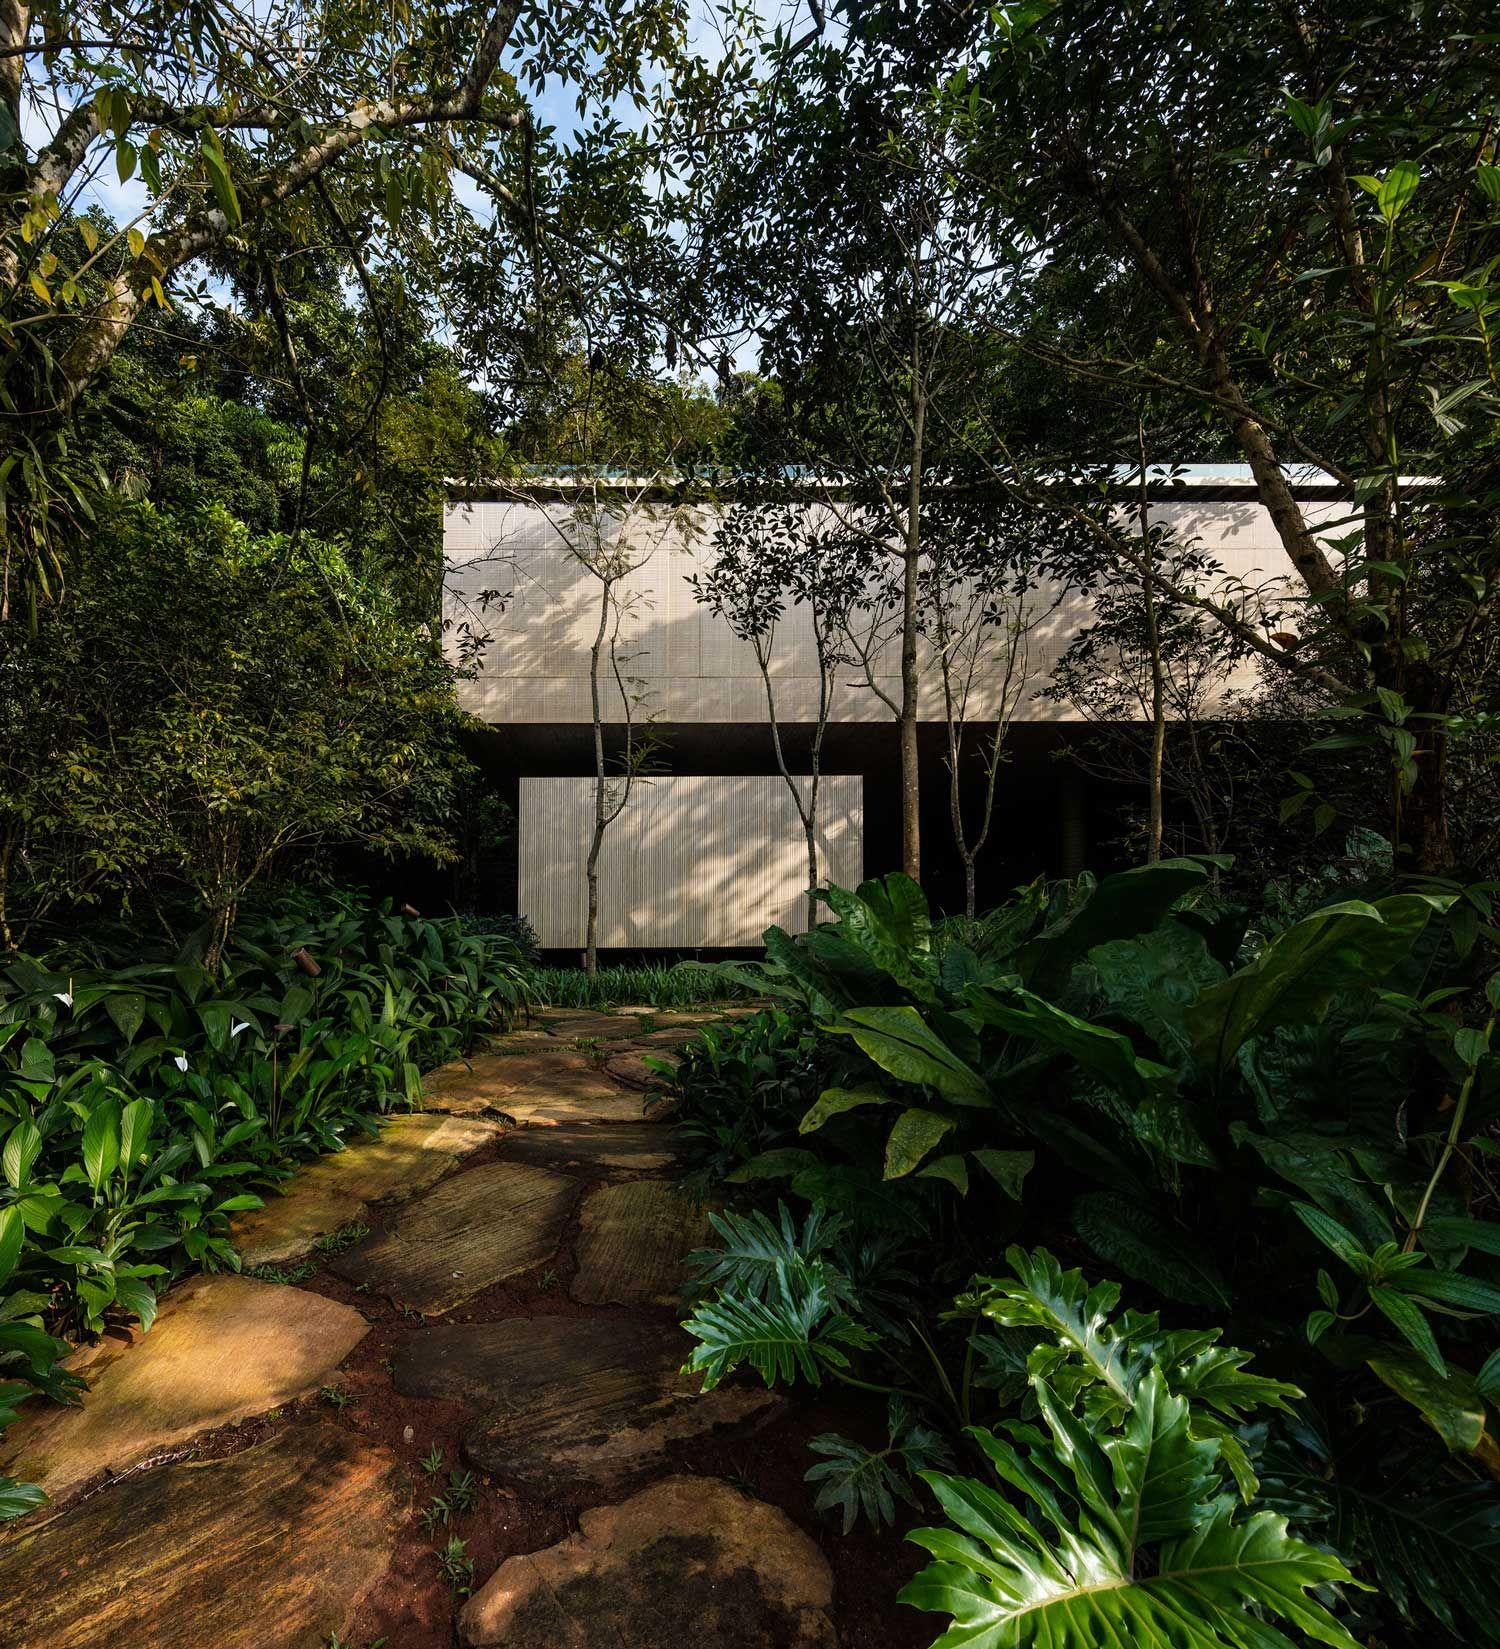 Open layout house concept by studio mk27 - Jungle House Casa Na Mata By Studio Mk27